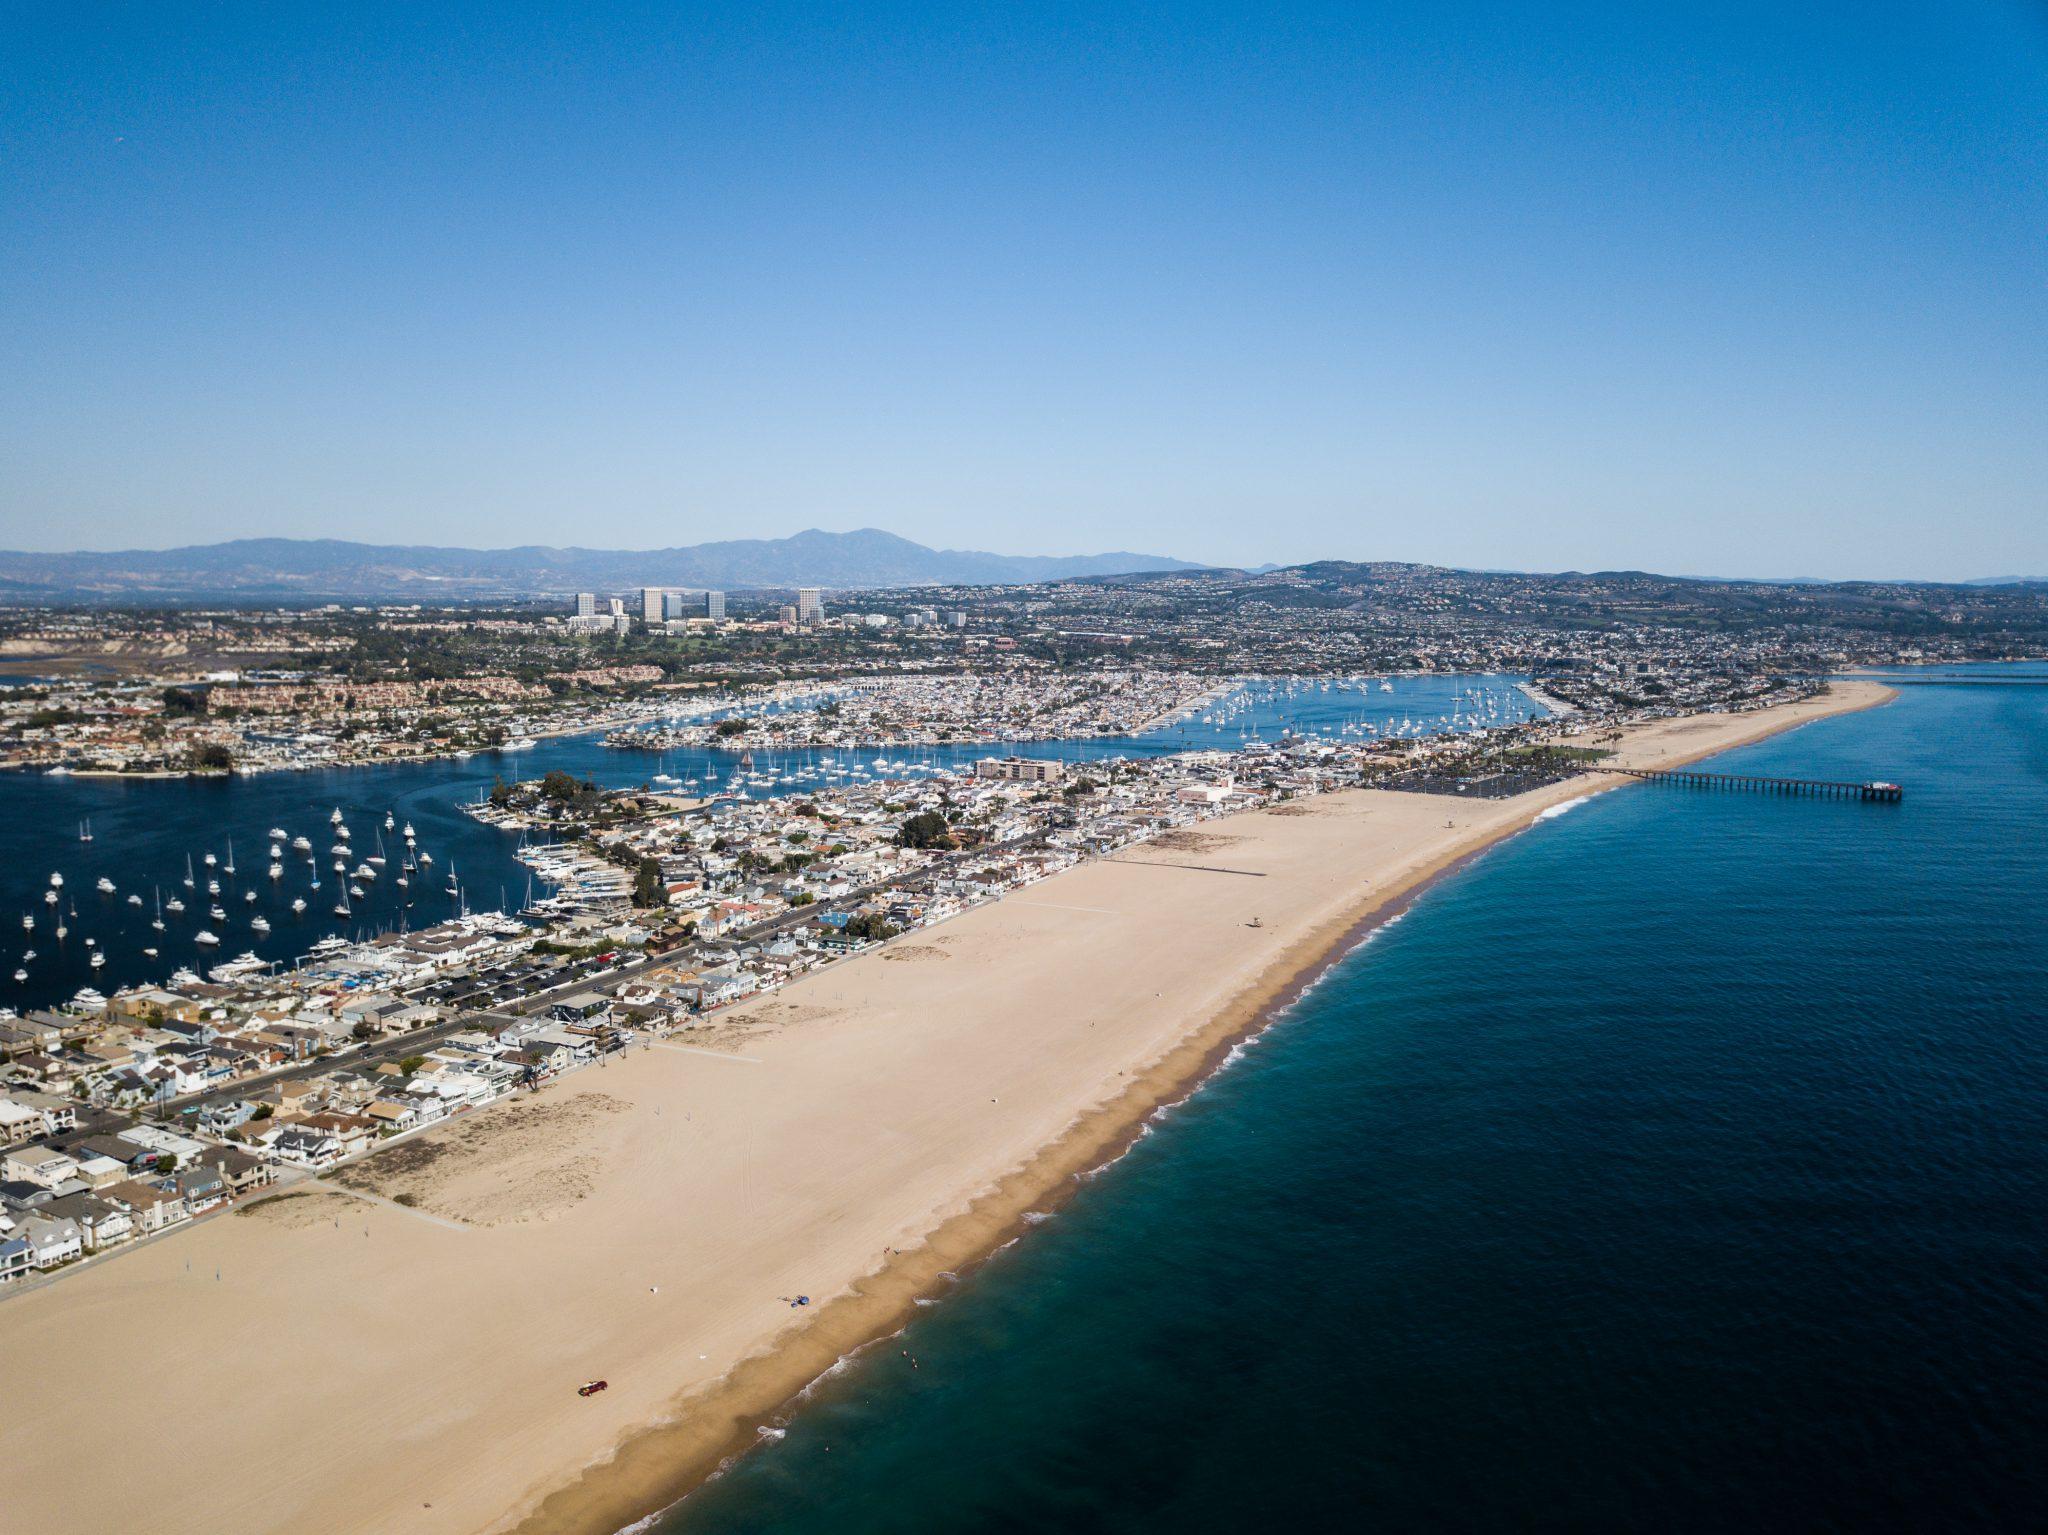 AB Capital moving its headquarters to Newport Center, near Fashion Island in Newport Beach, CA